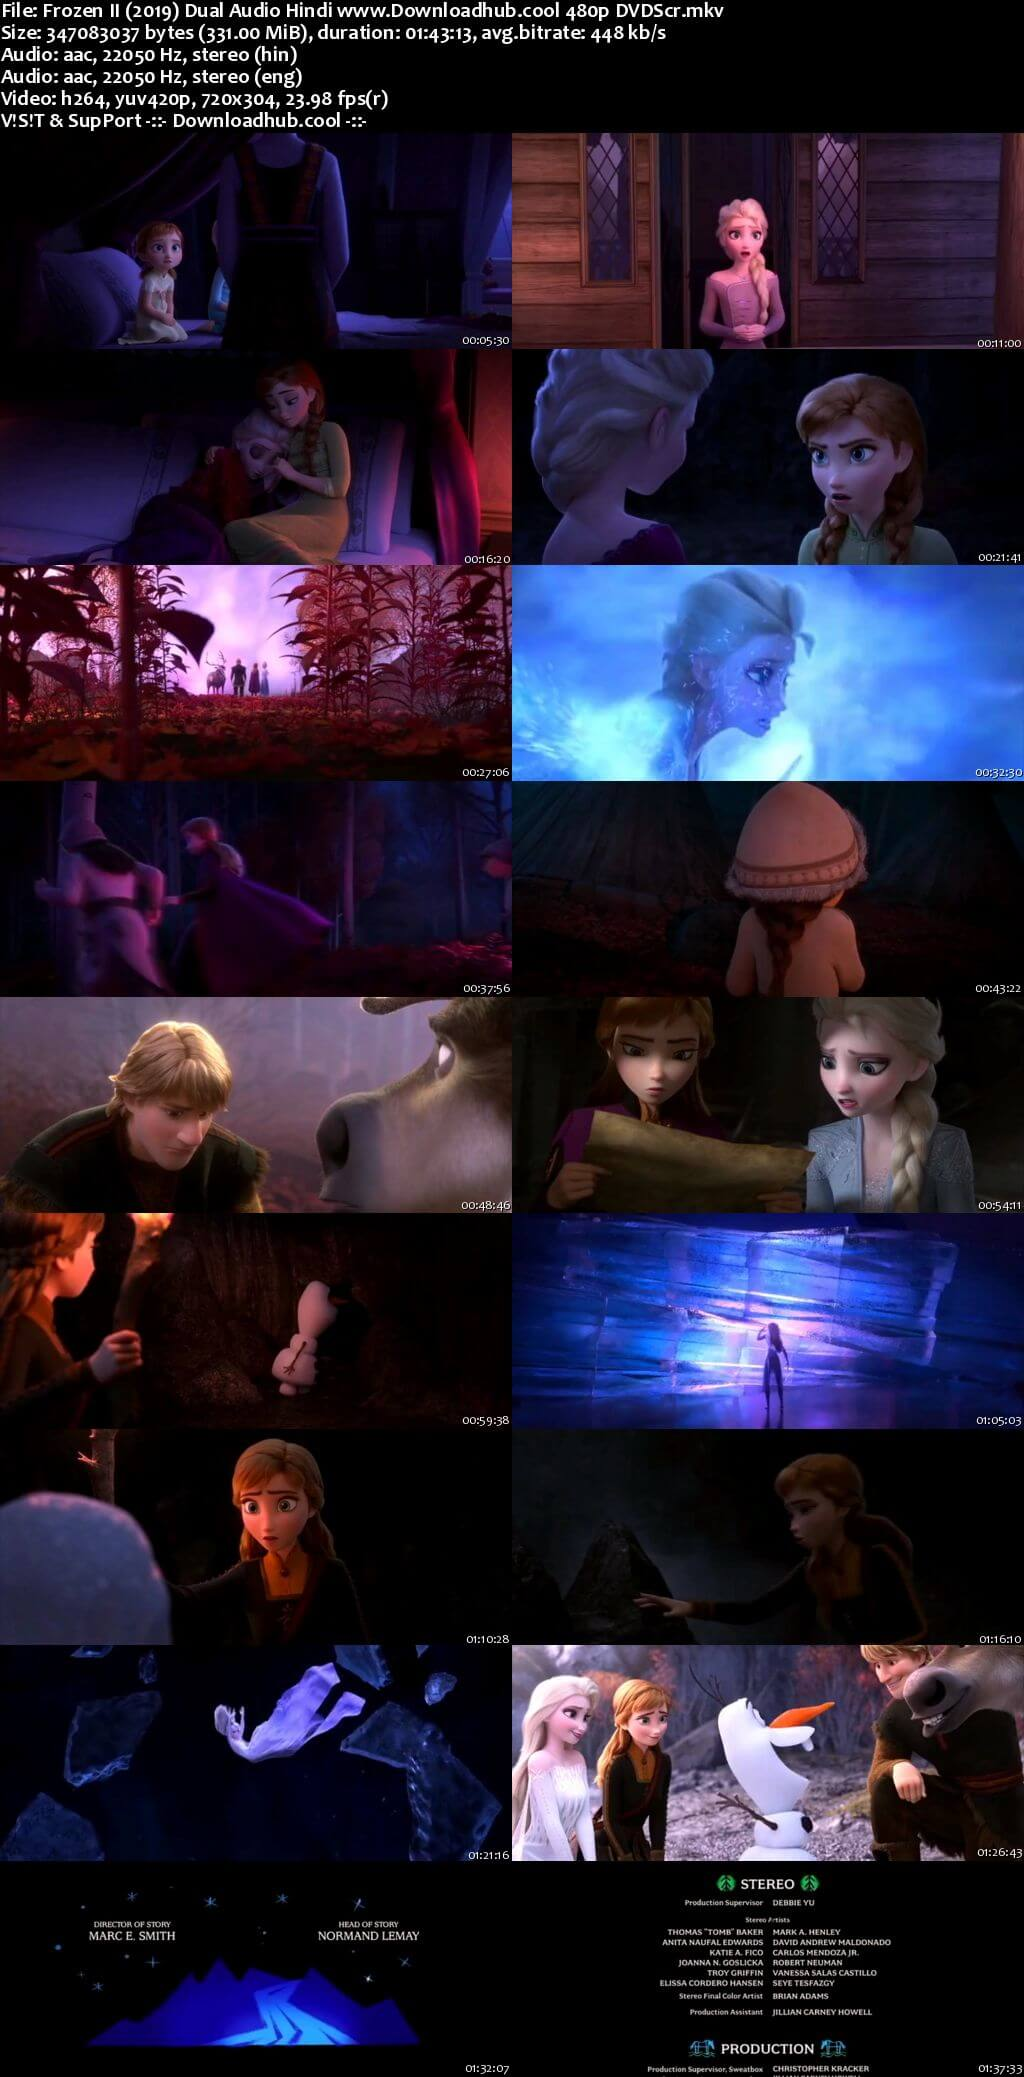 Frozen II 2019 Hindi Dual Audio 300MB DVDScr 480p